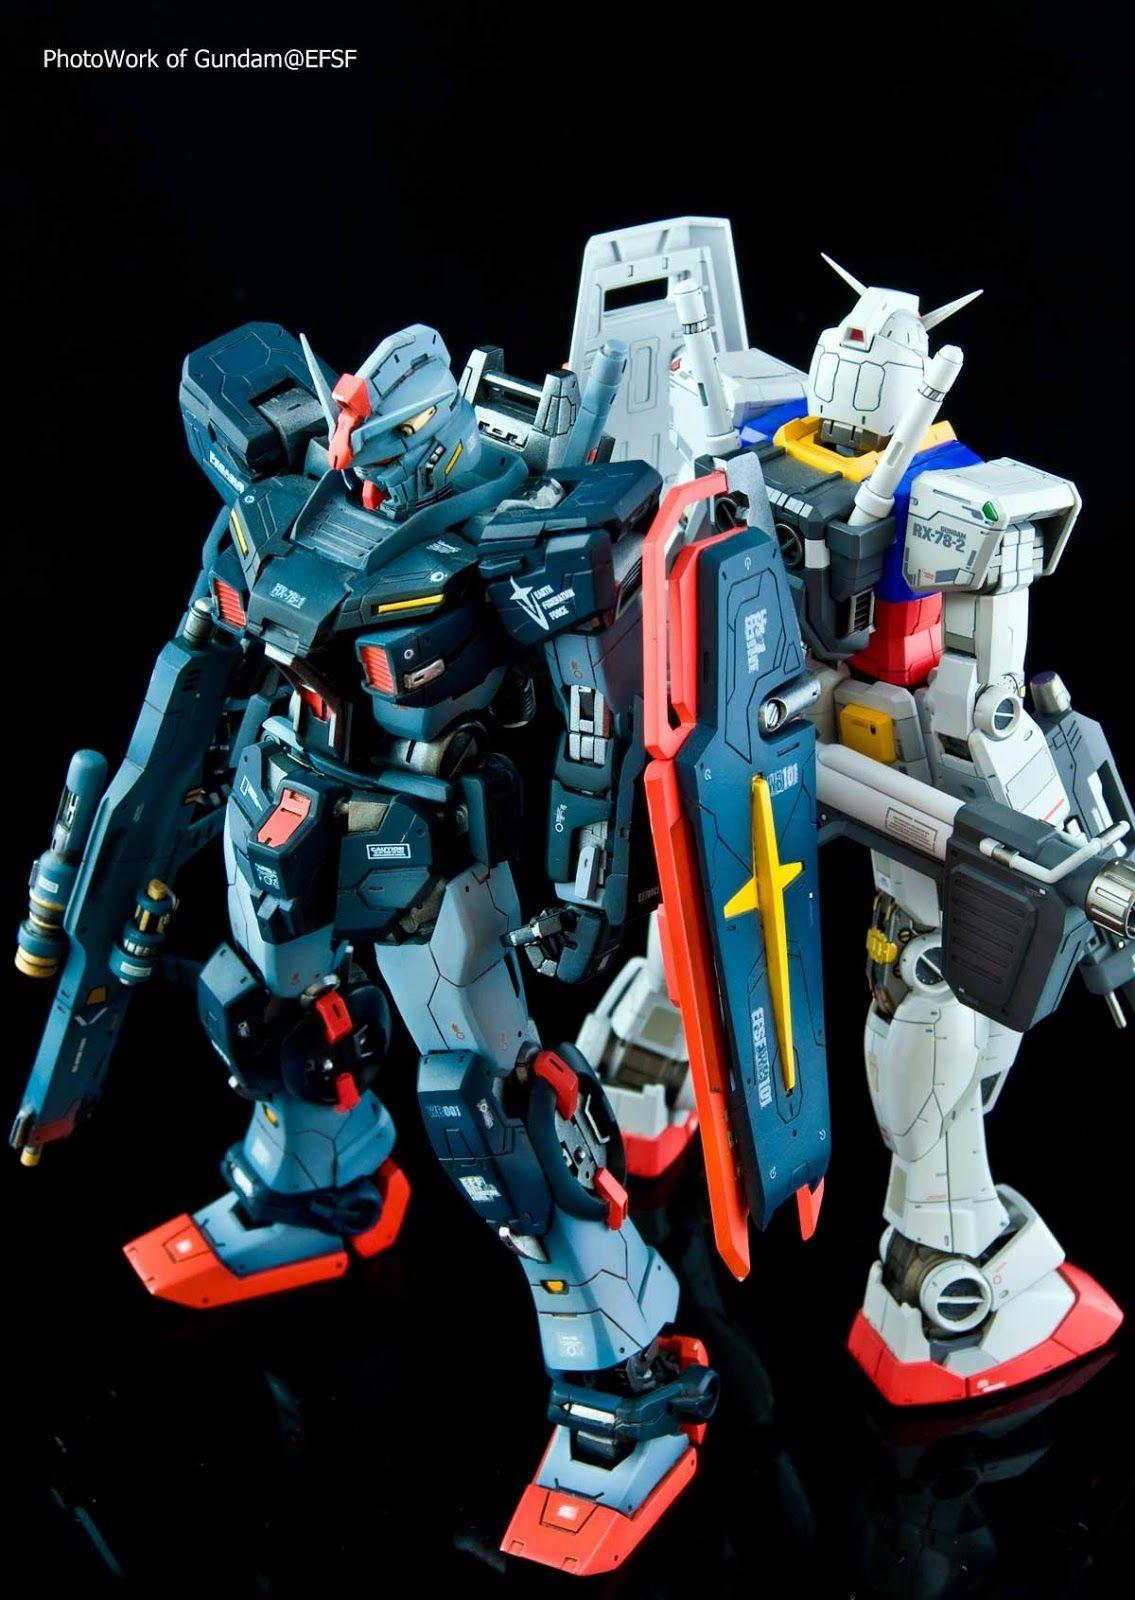 Gurren Lagann Papercraft 1 100 Rx 78 2 Gundam Parison by Gundam Efsf Via